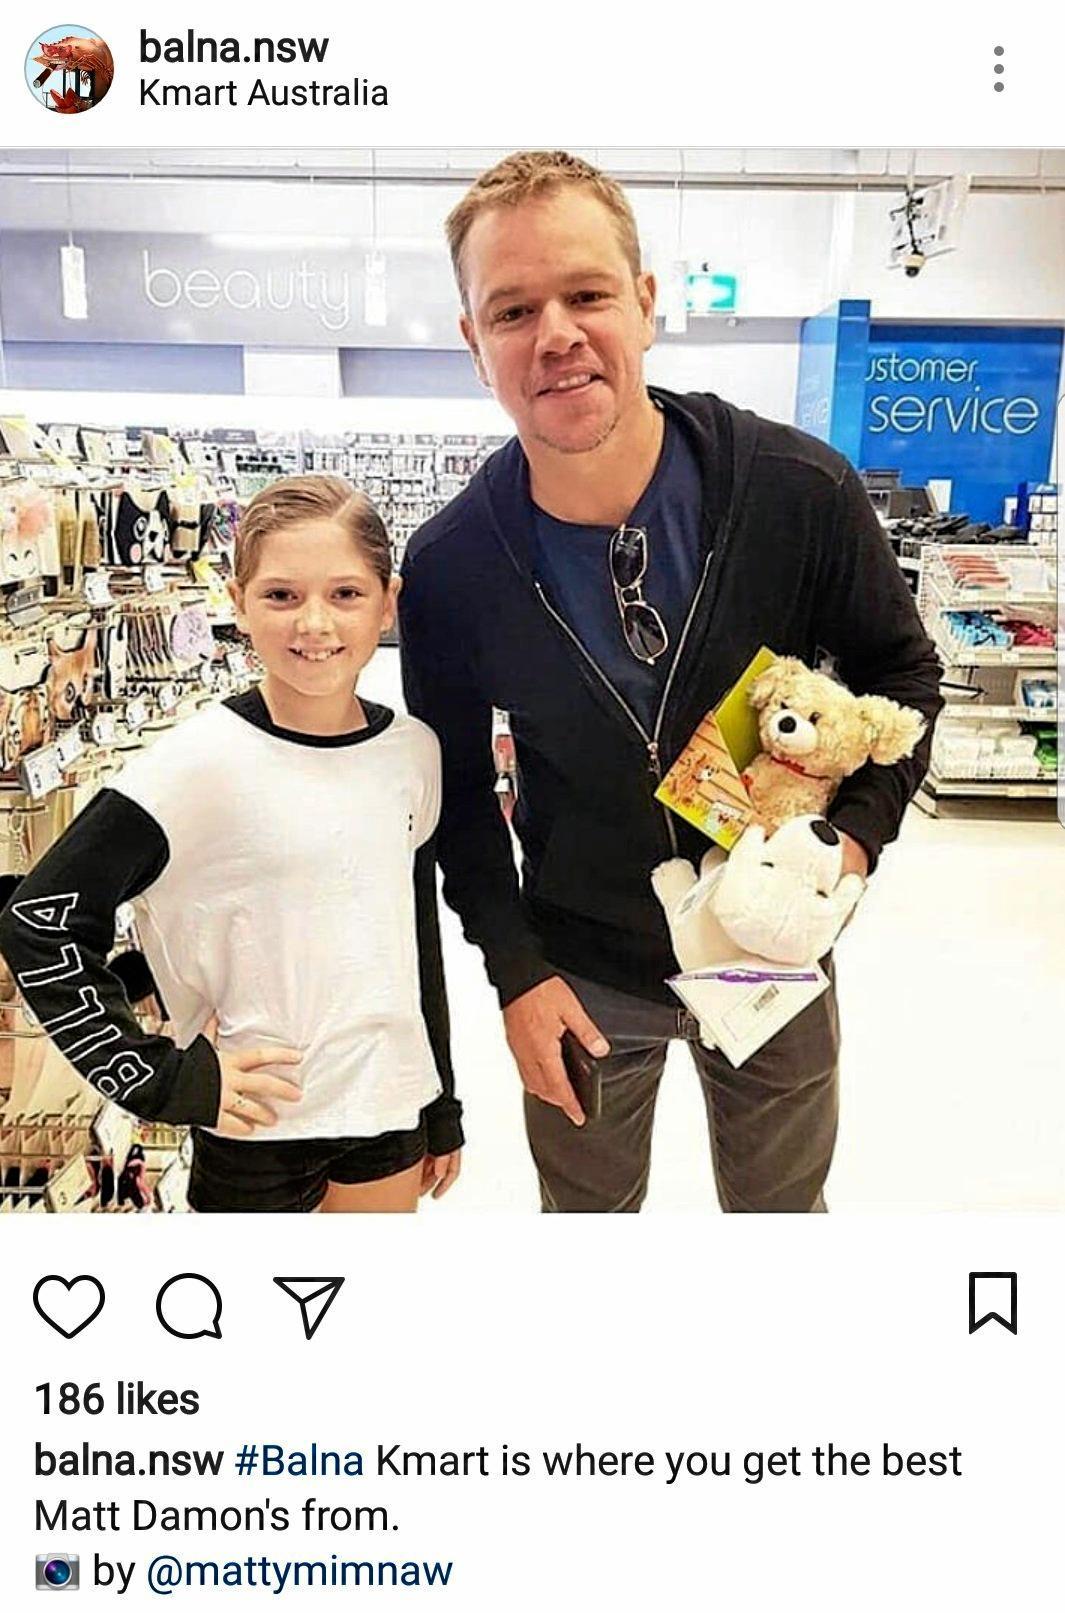 Matt Damon spotted in Kmart, Ballina.